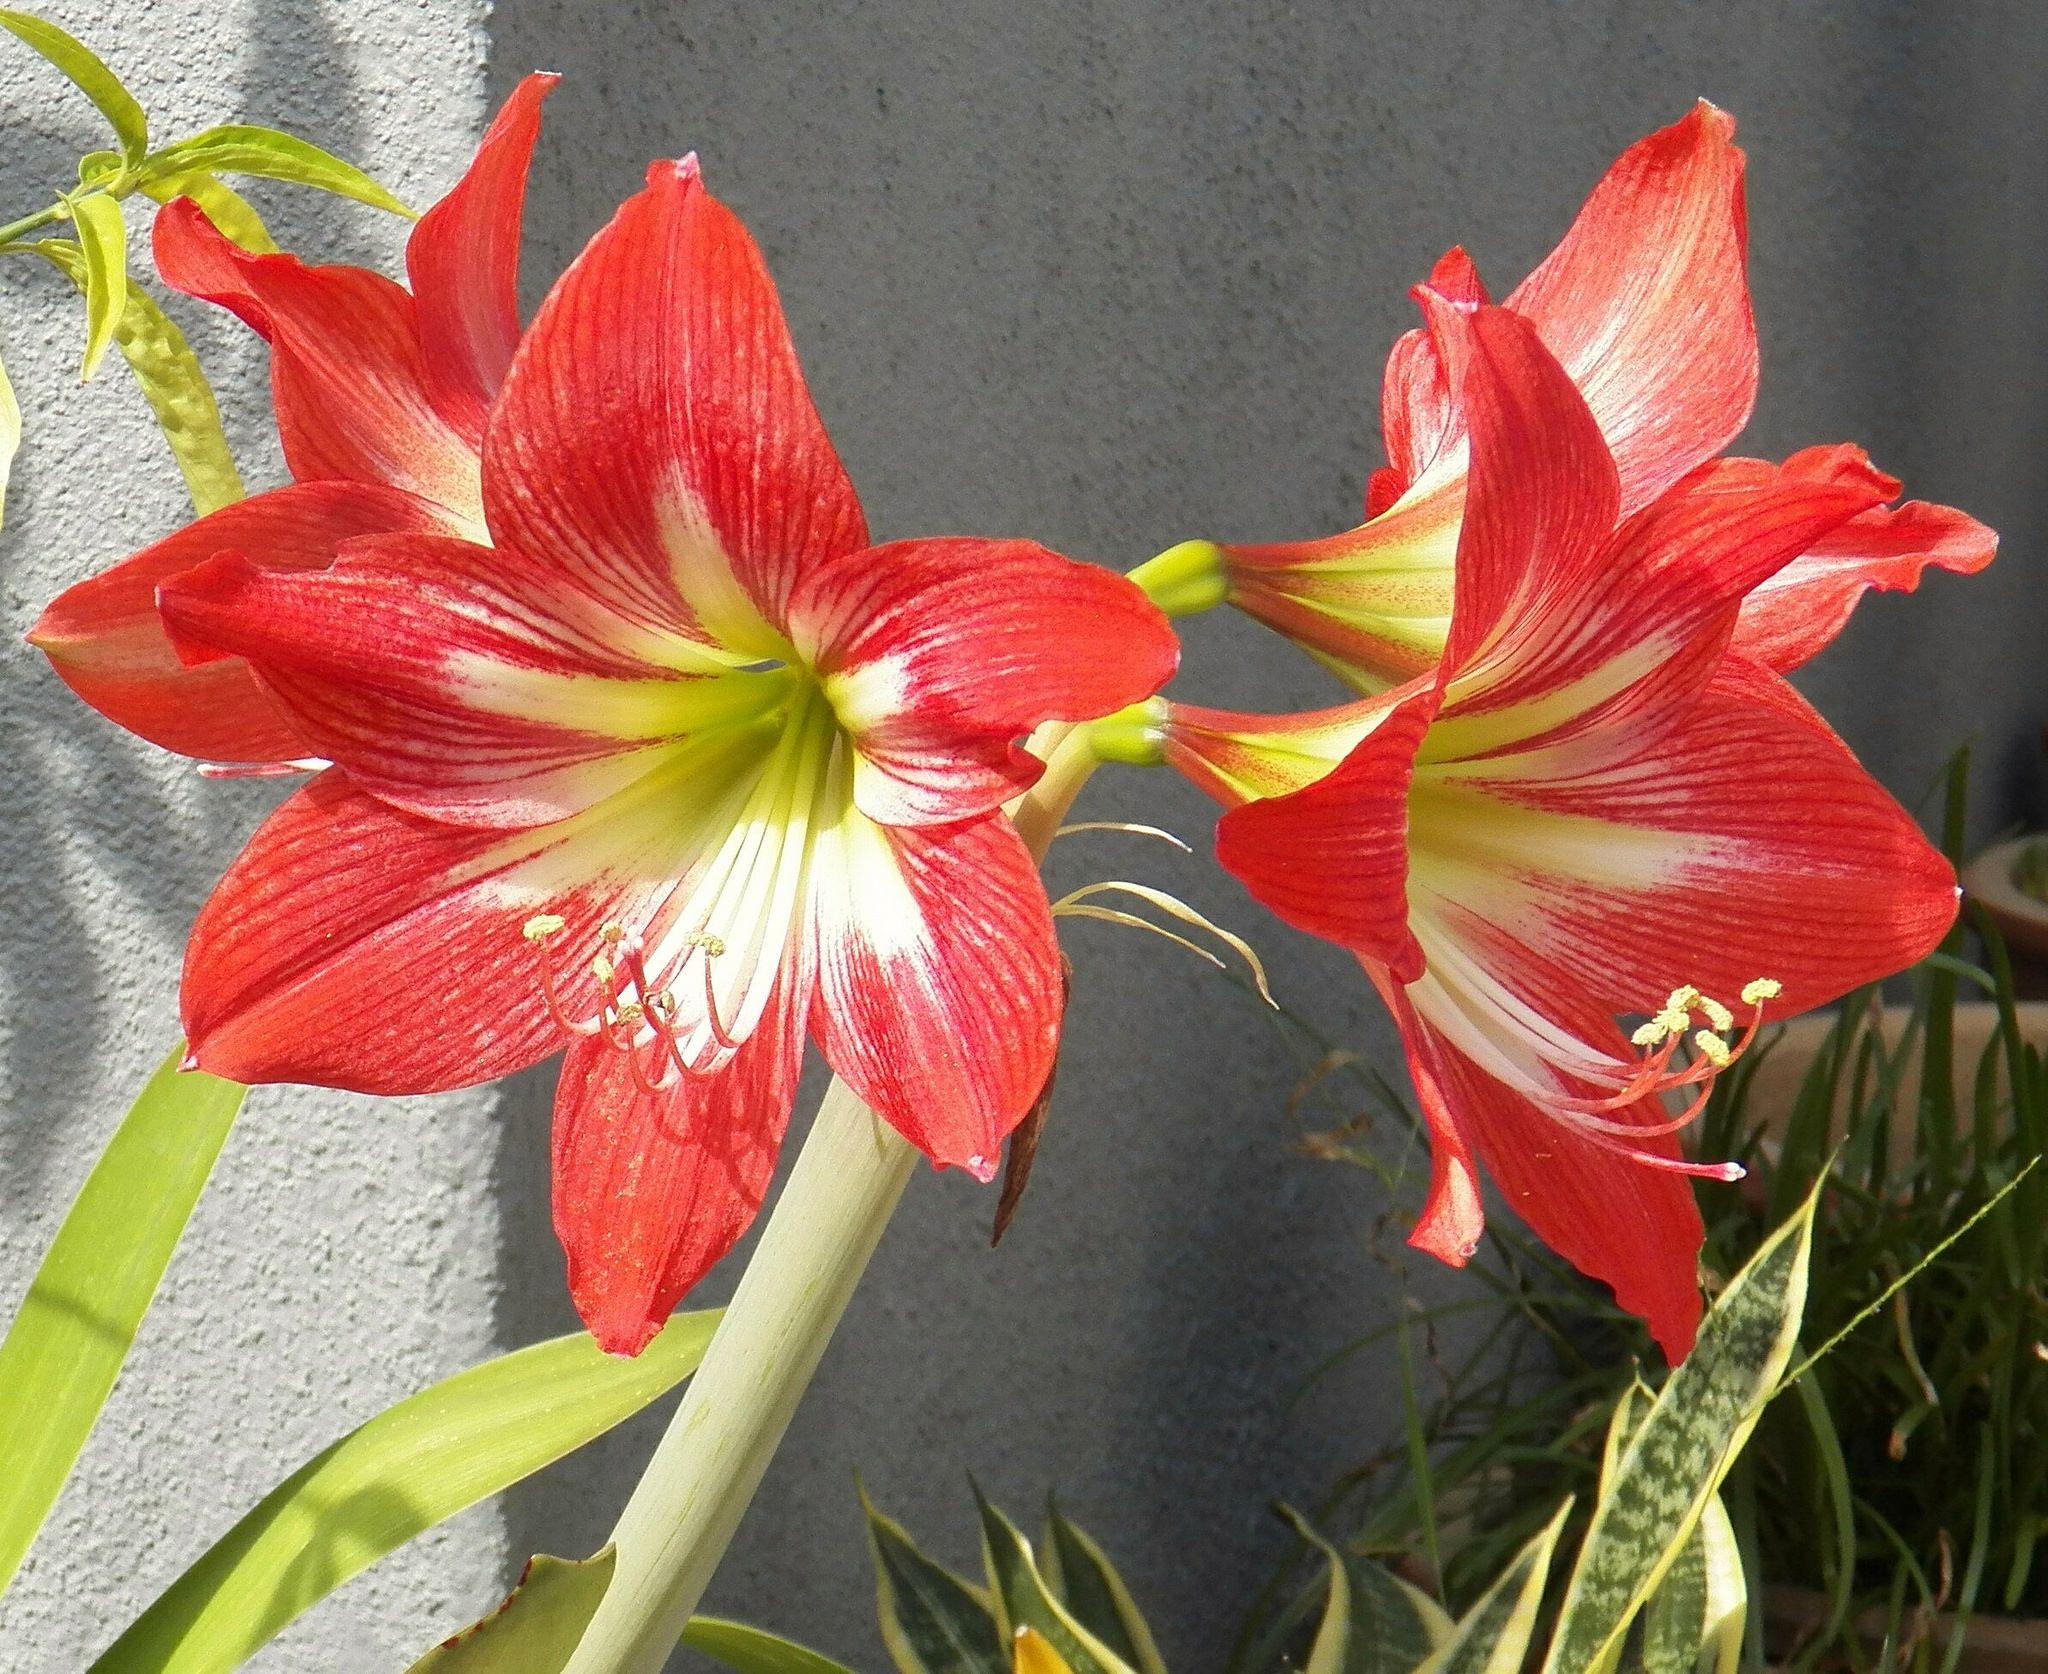 Amaryllis Lily 孤挺花 Easter Lily Amaryllis Flowers